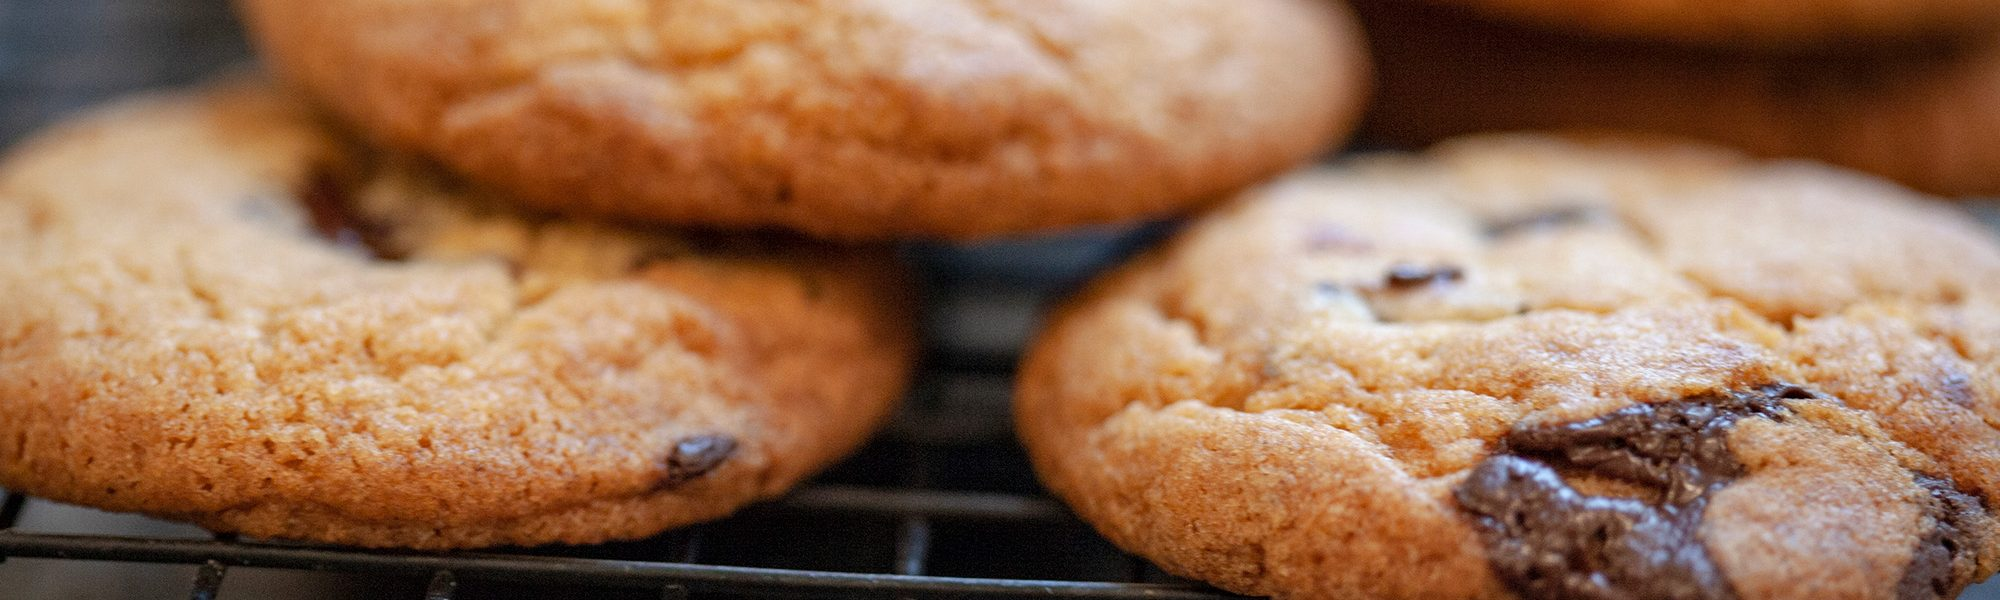 biscuits01